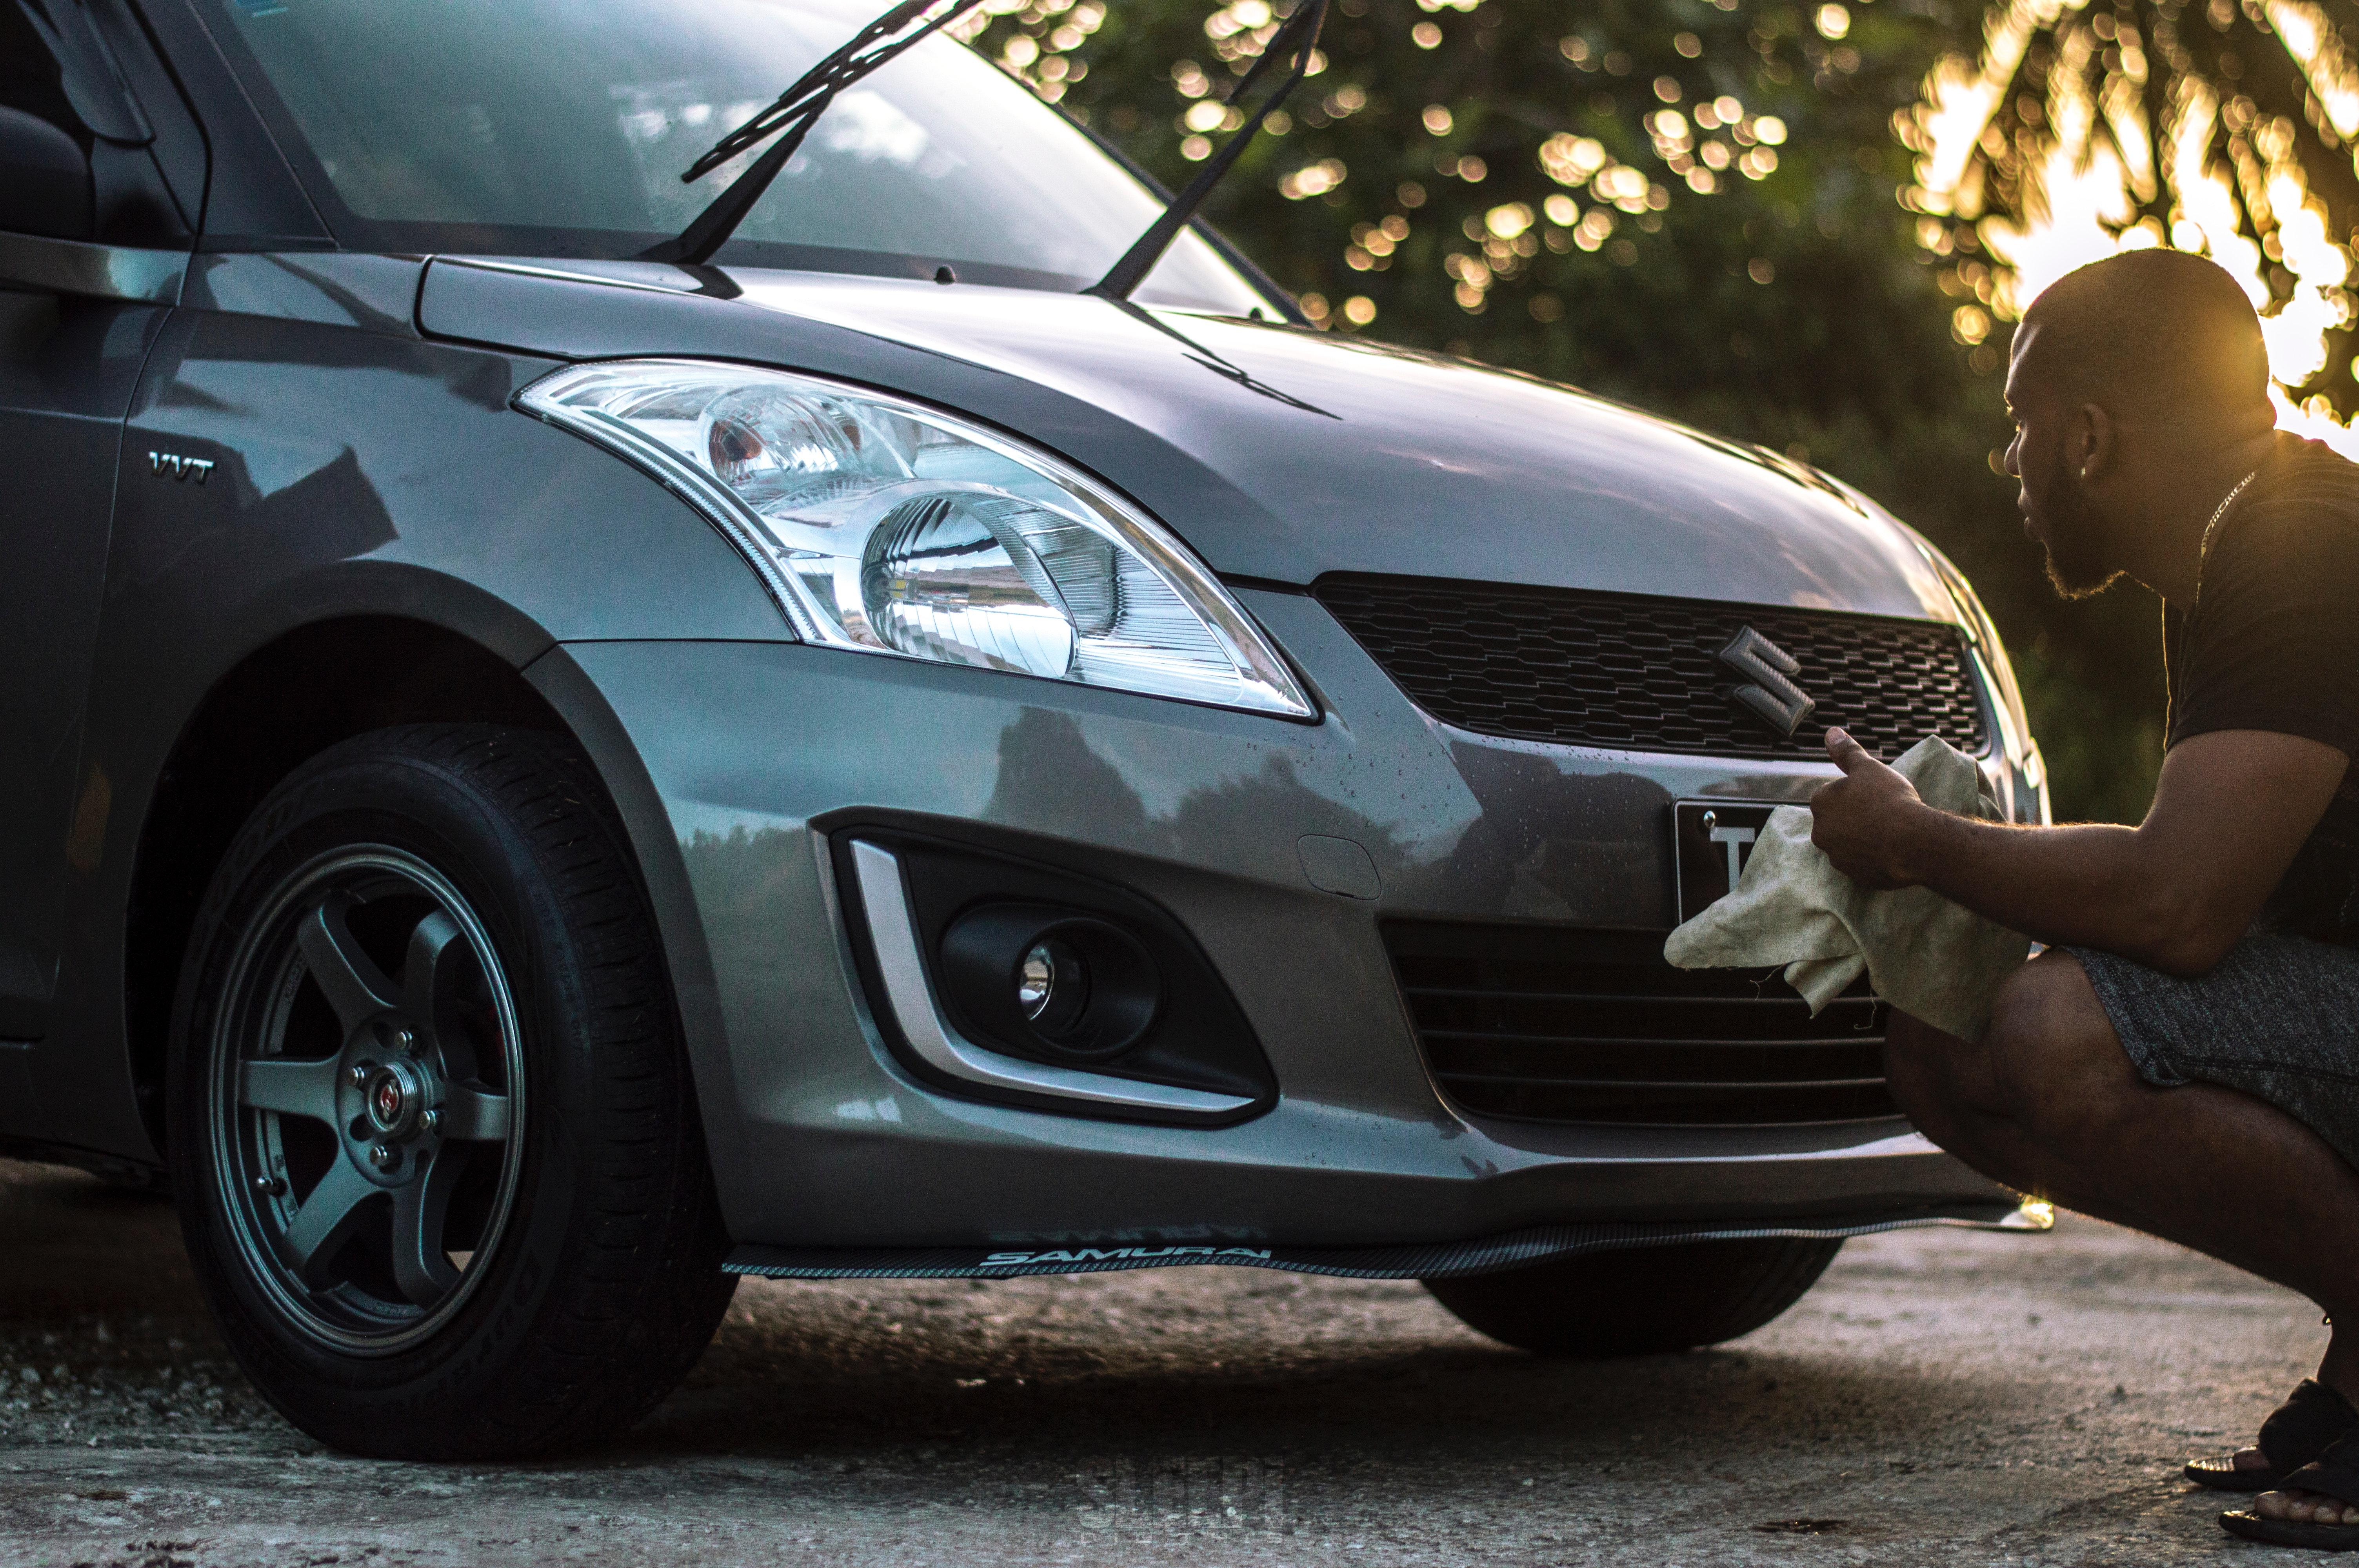 washing new car